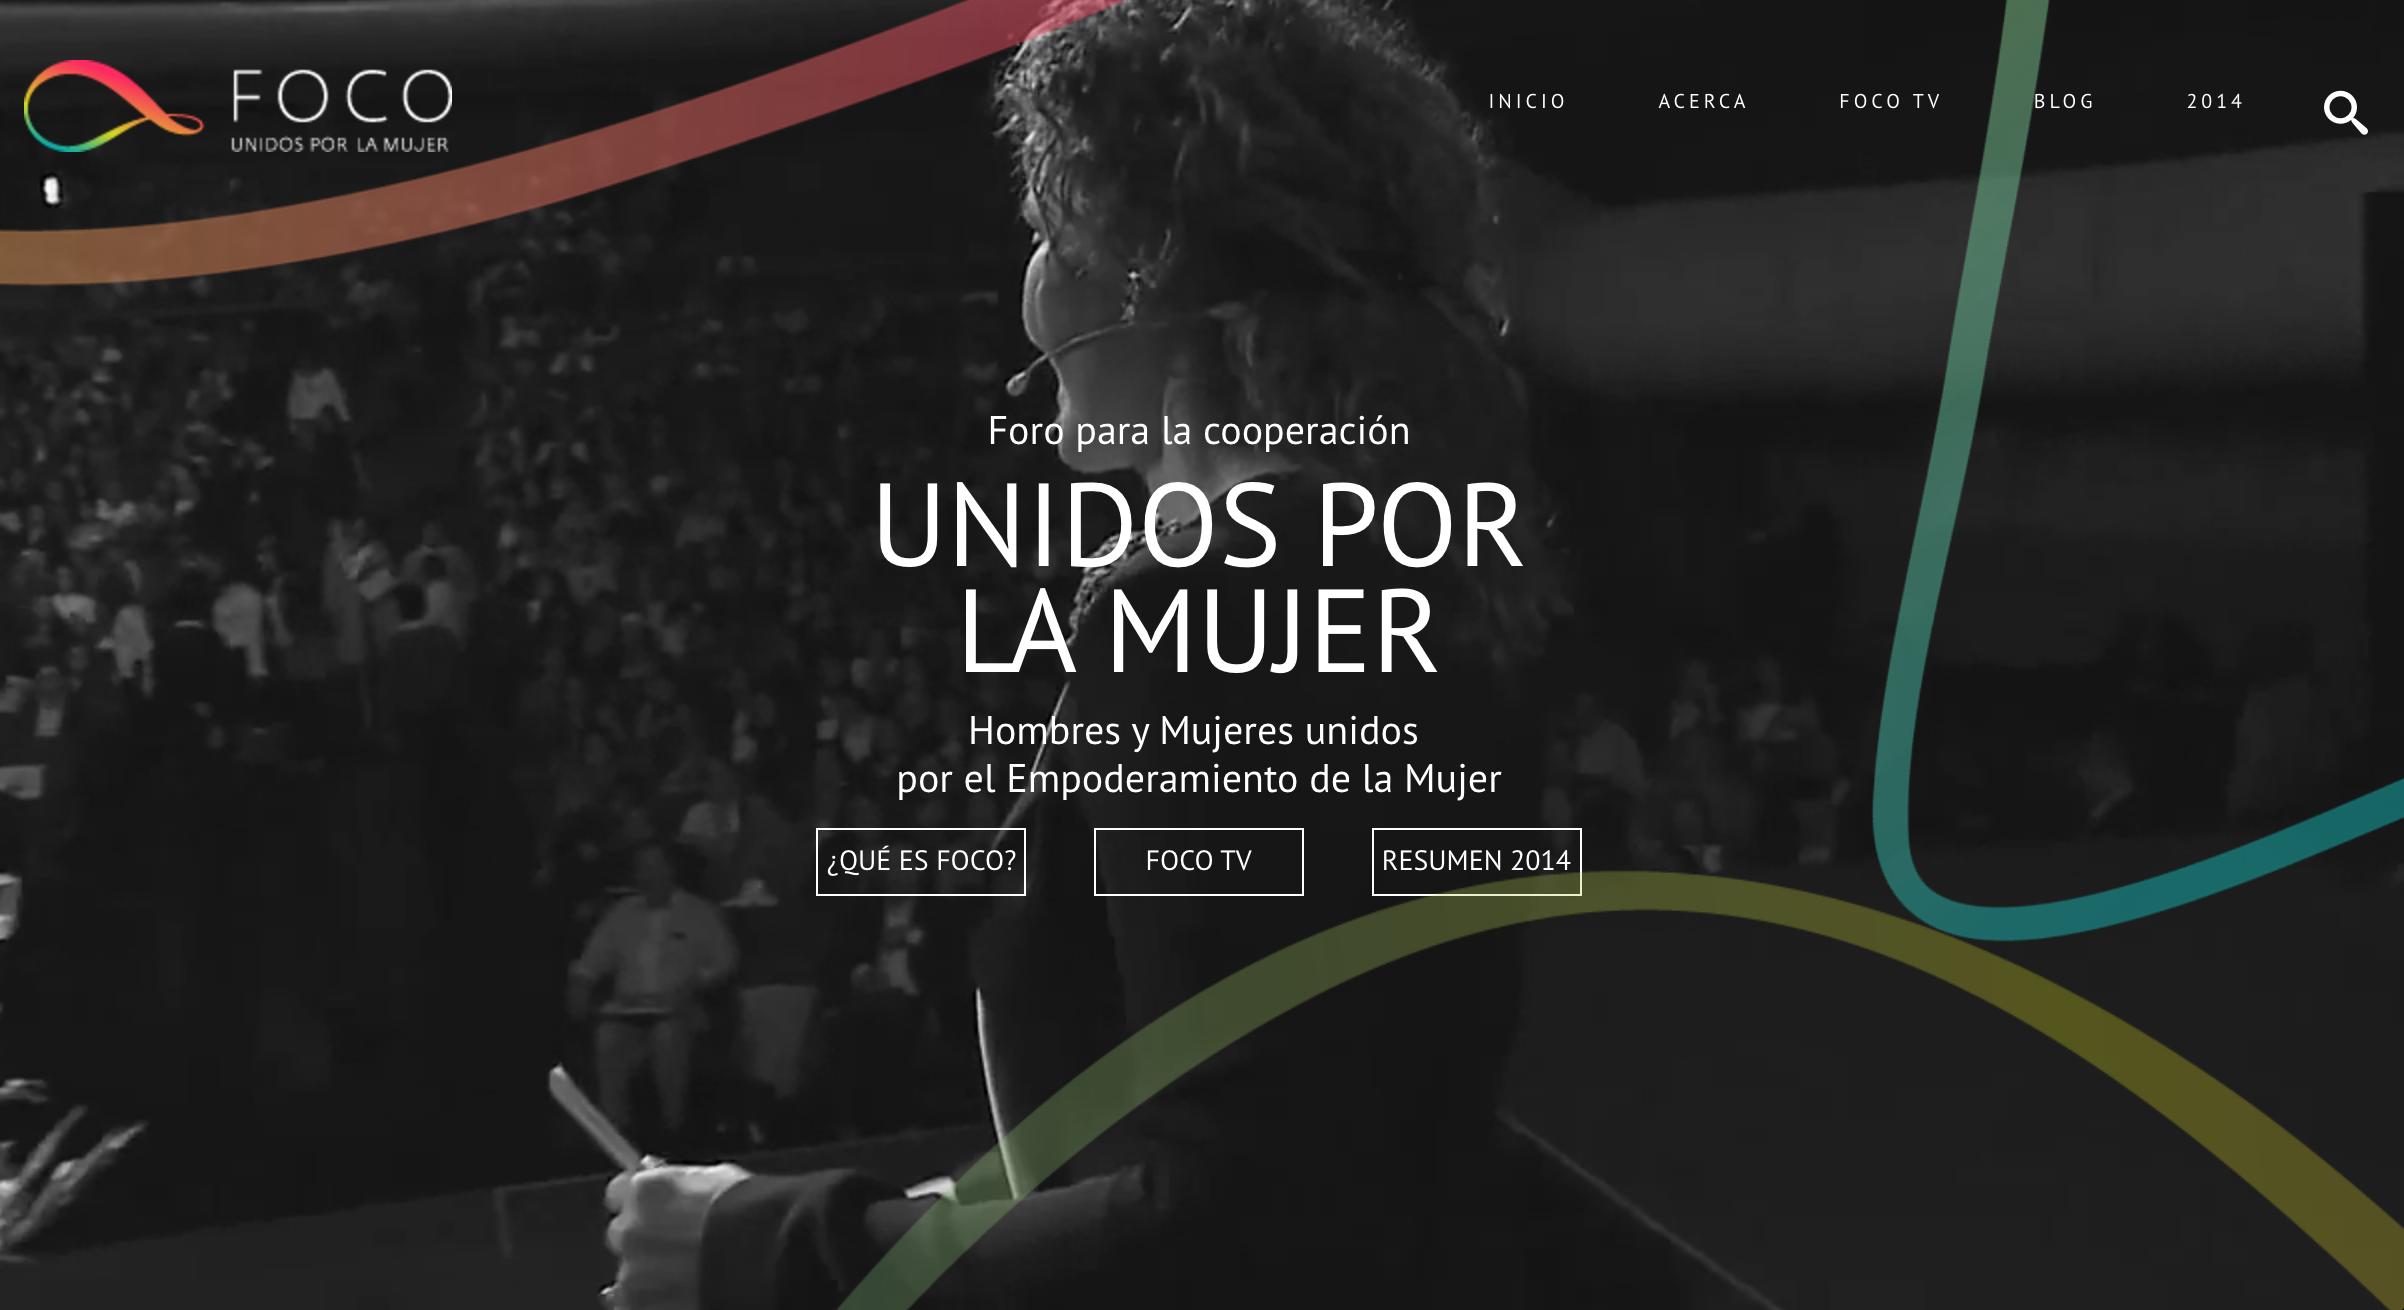 foco event conference website design